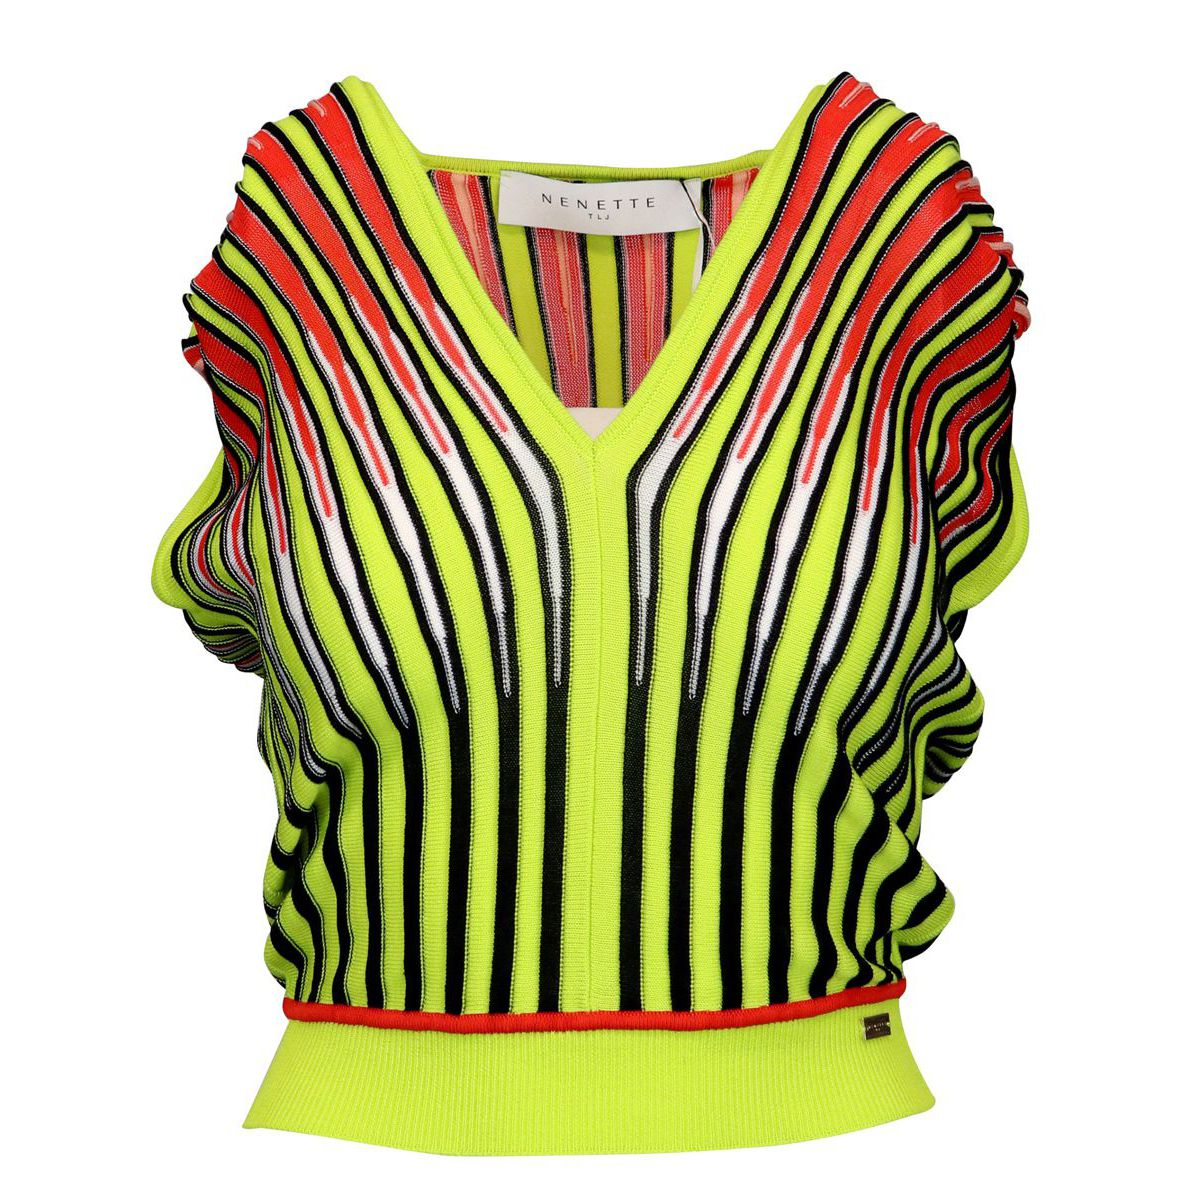 Viscose blend sweater with vertical multicolor striped pattern Black Nenette